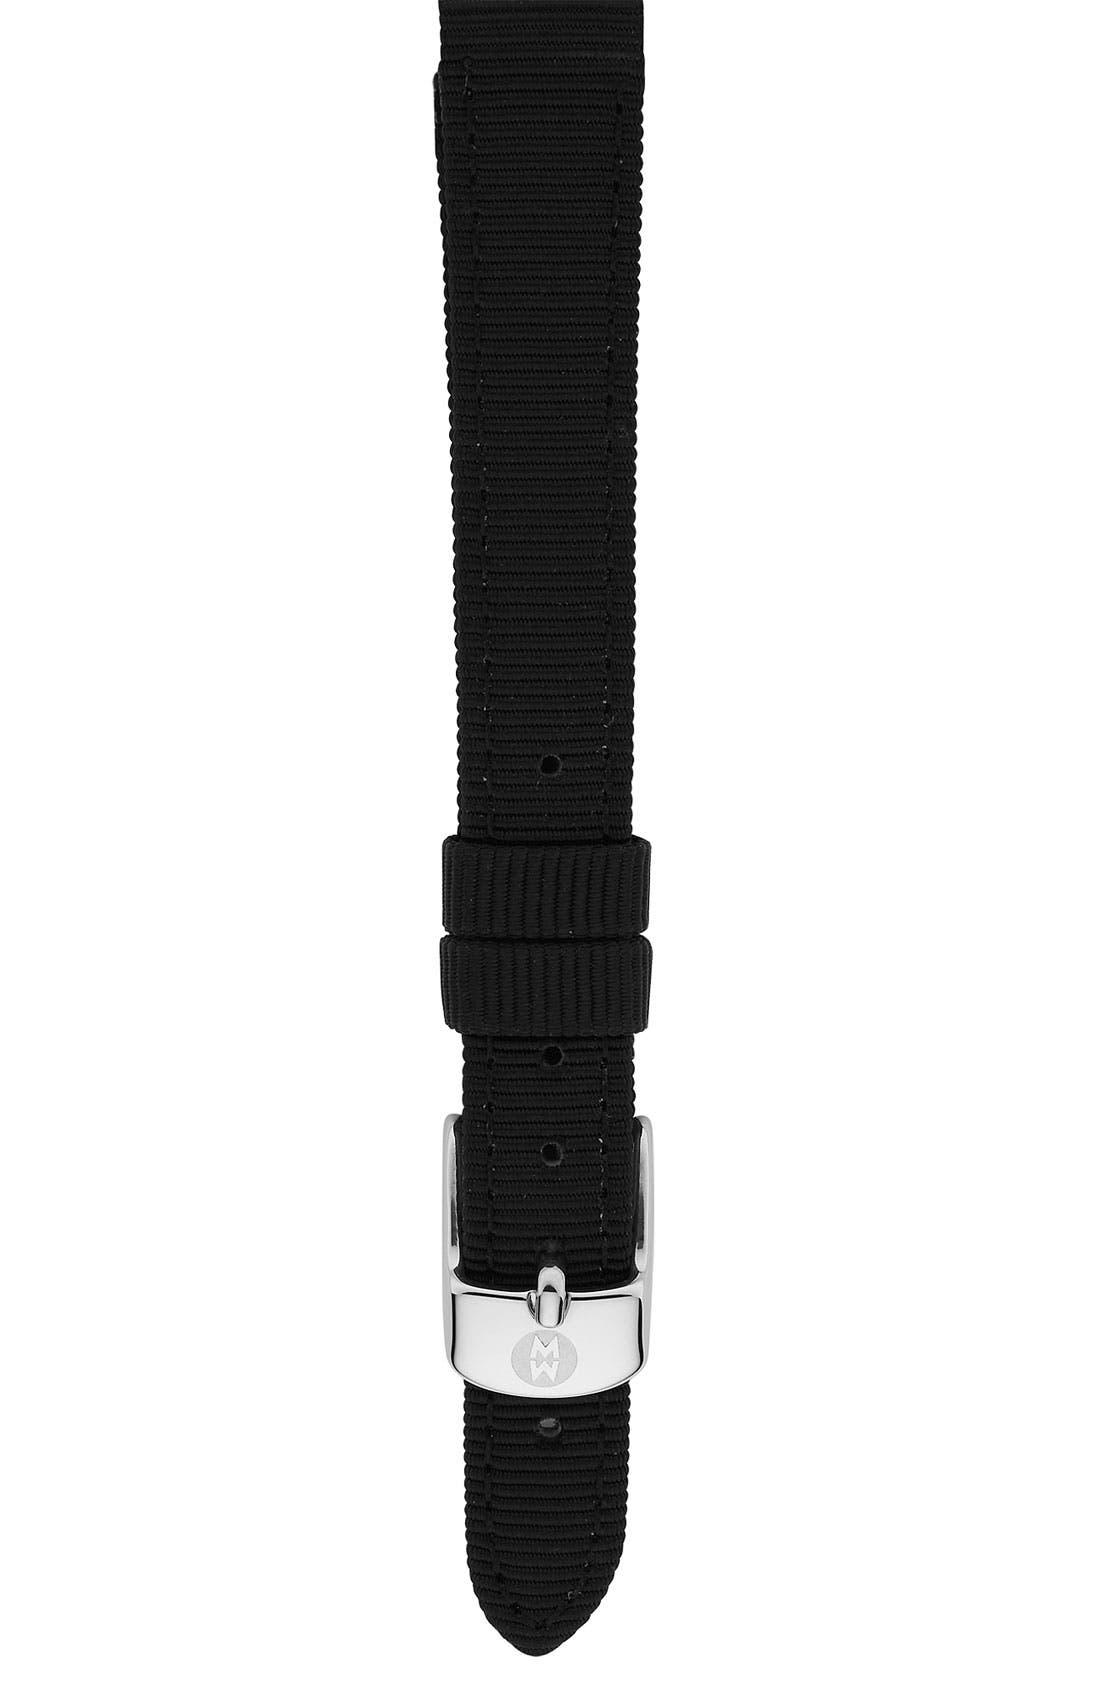 Alternate Image 1 Selected - MICHELE 12mm Grosgrain Watch Strap